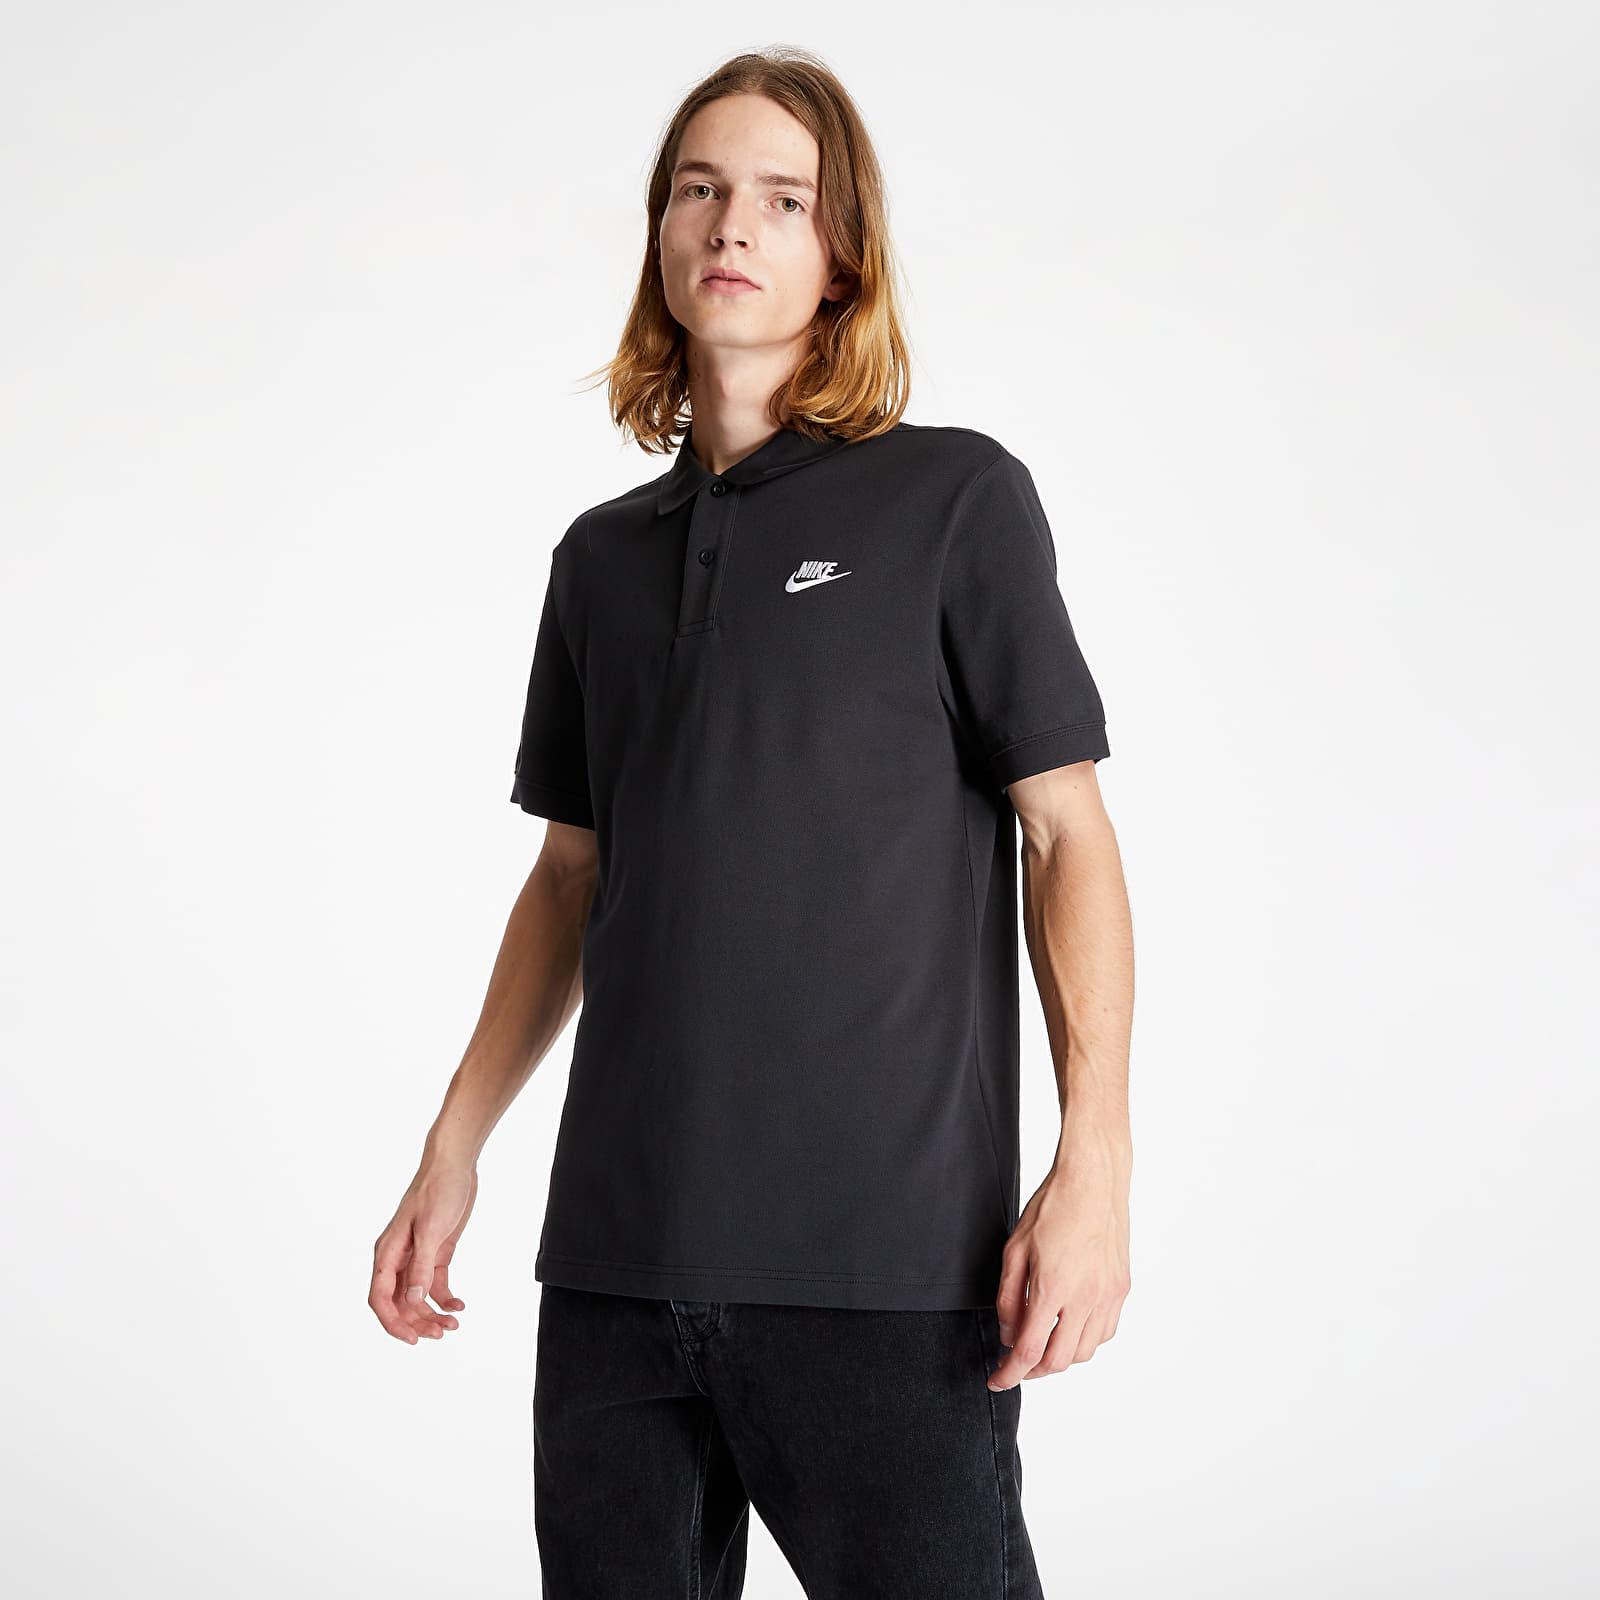 Nike Sportswear Polo Tee Black/ White S